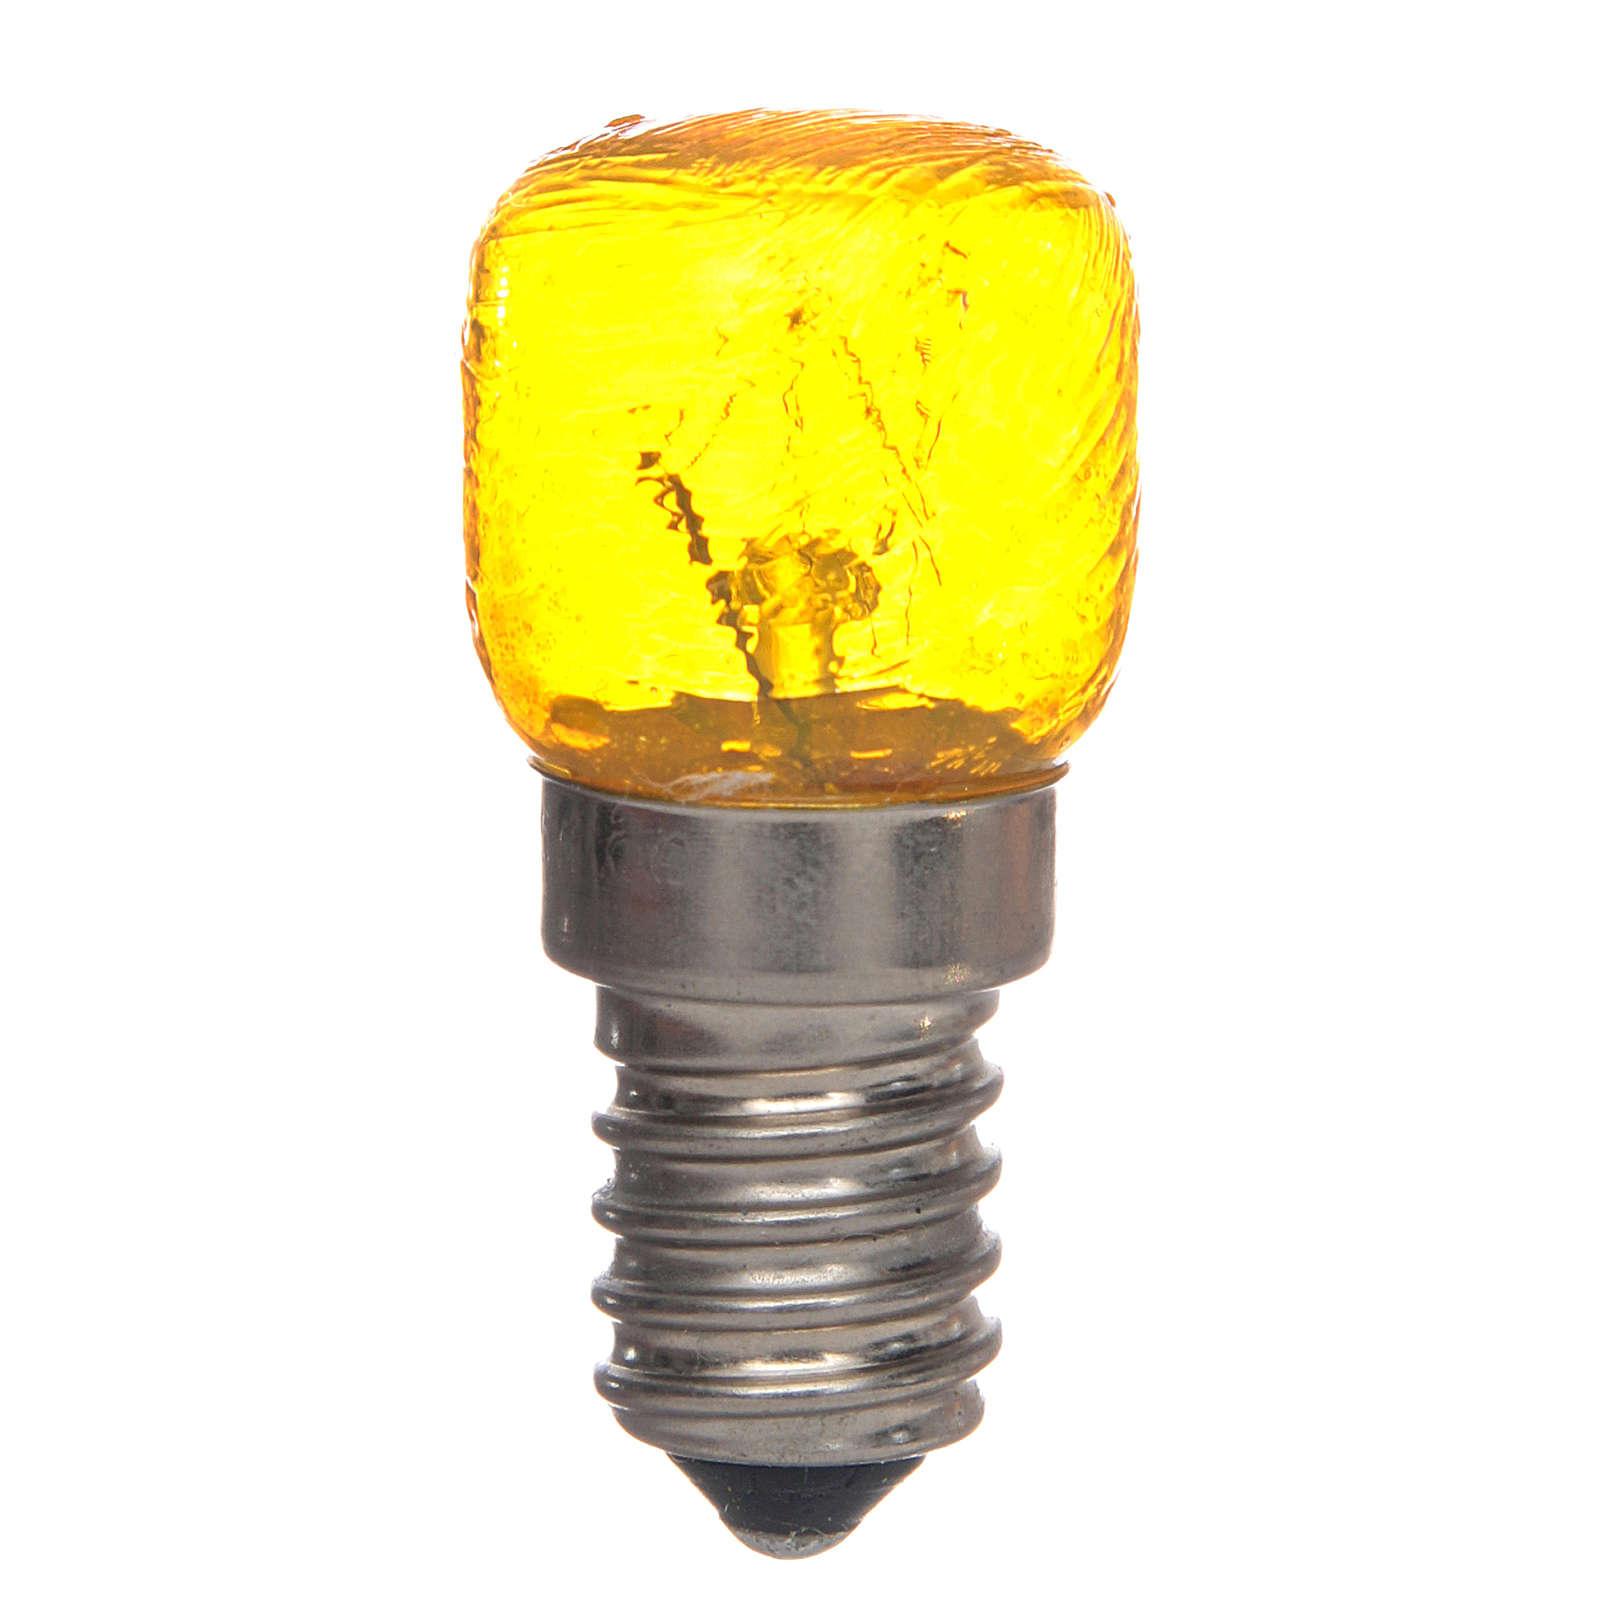 LED light, yellow, E14, 15W, 220V 4